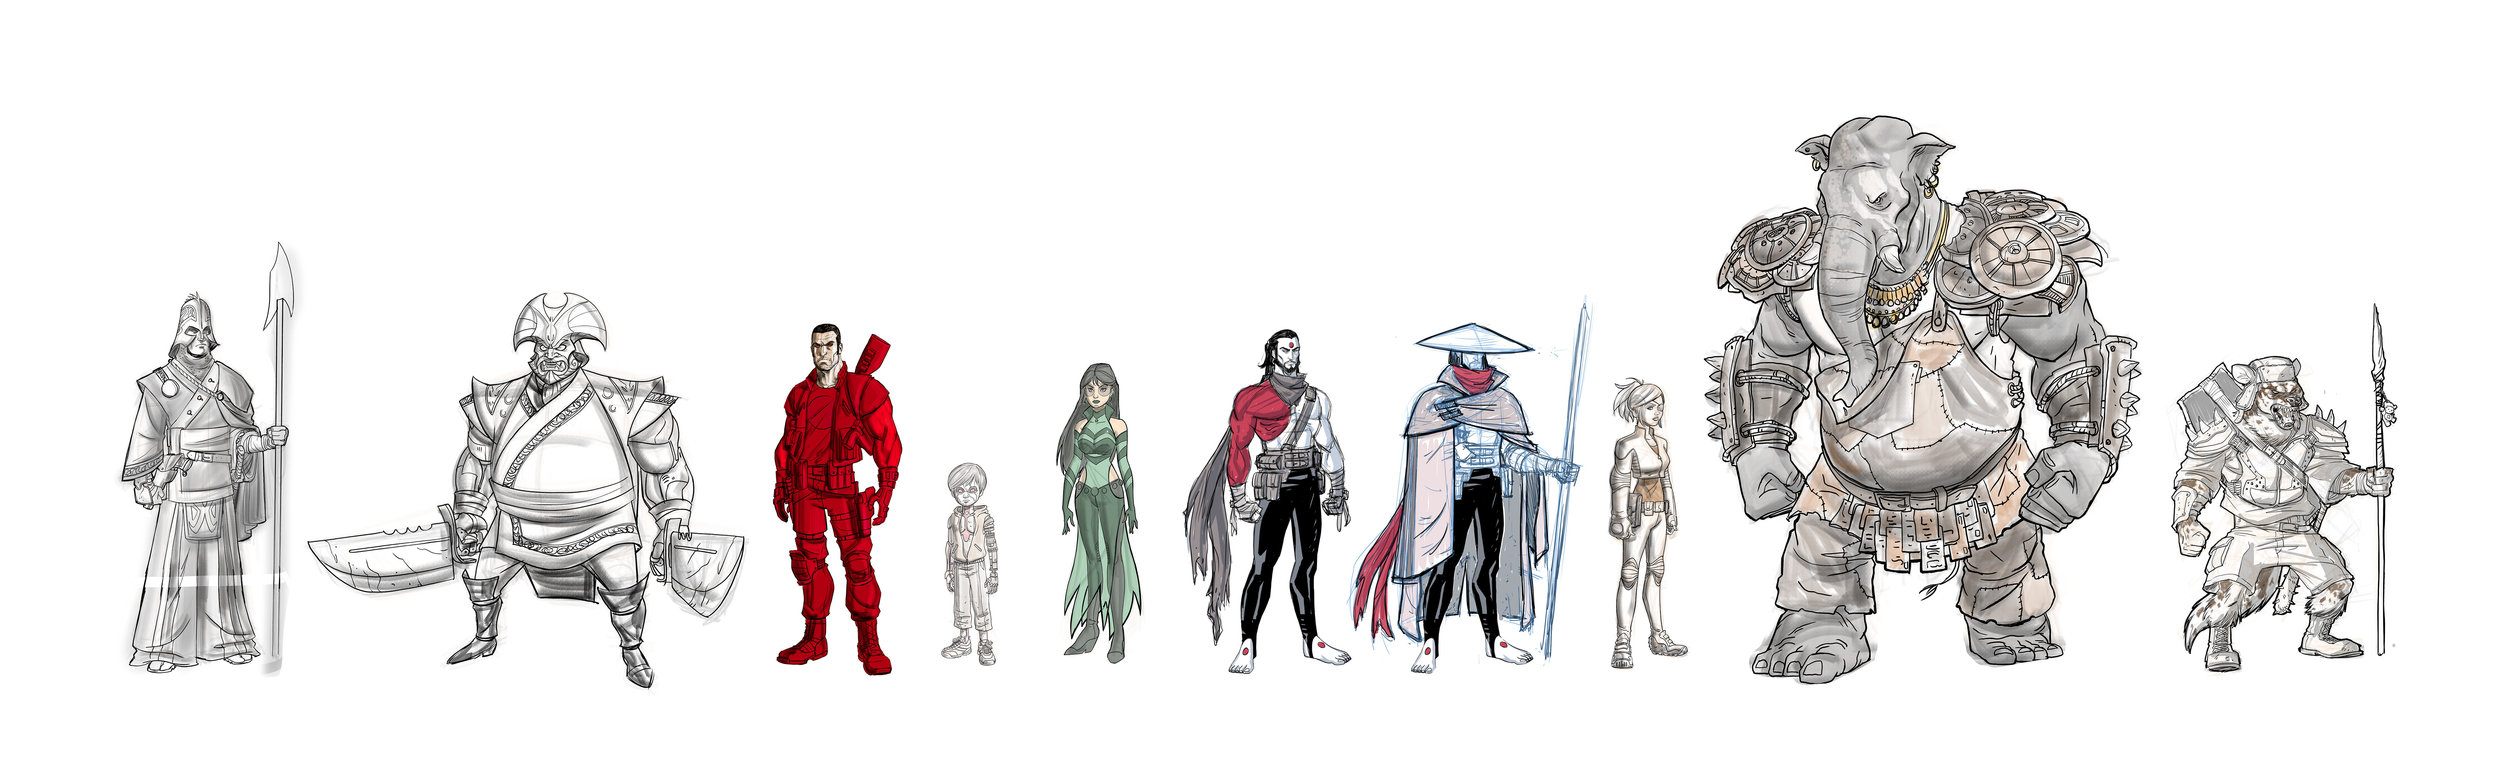 FALLEN WORLD Character Designs by AJ Jothikumar. From left to right: Acolyte of the Fallen, The Circadian, Bloodshot, Raijin, Karana, Rai, Rai, Lula, Ka'Orta, Kor'tanga Warrior